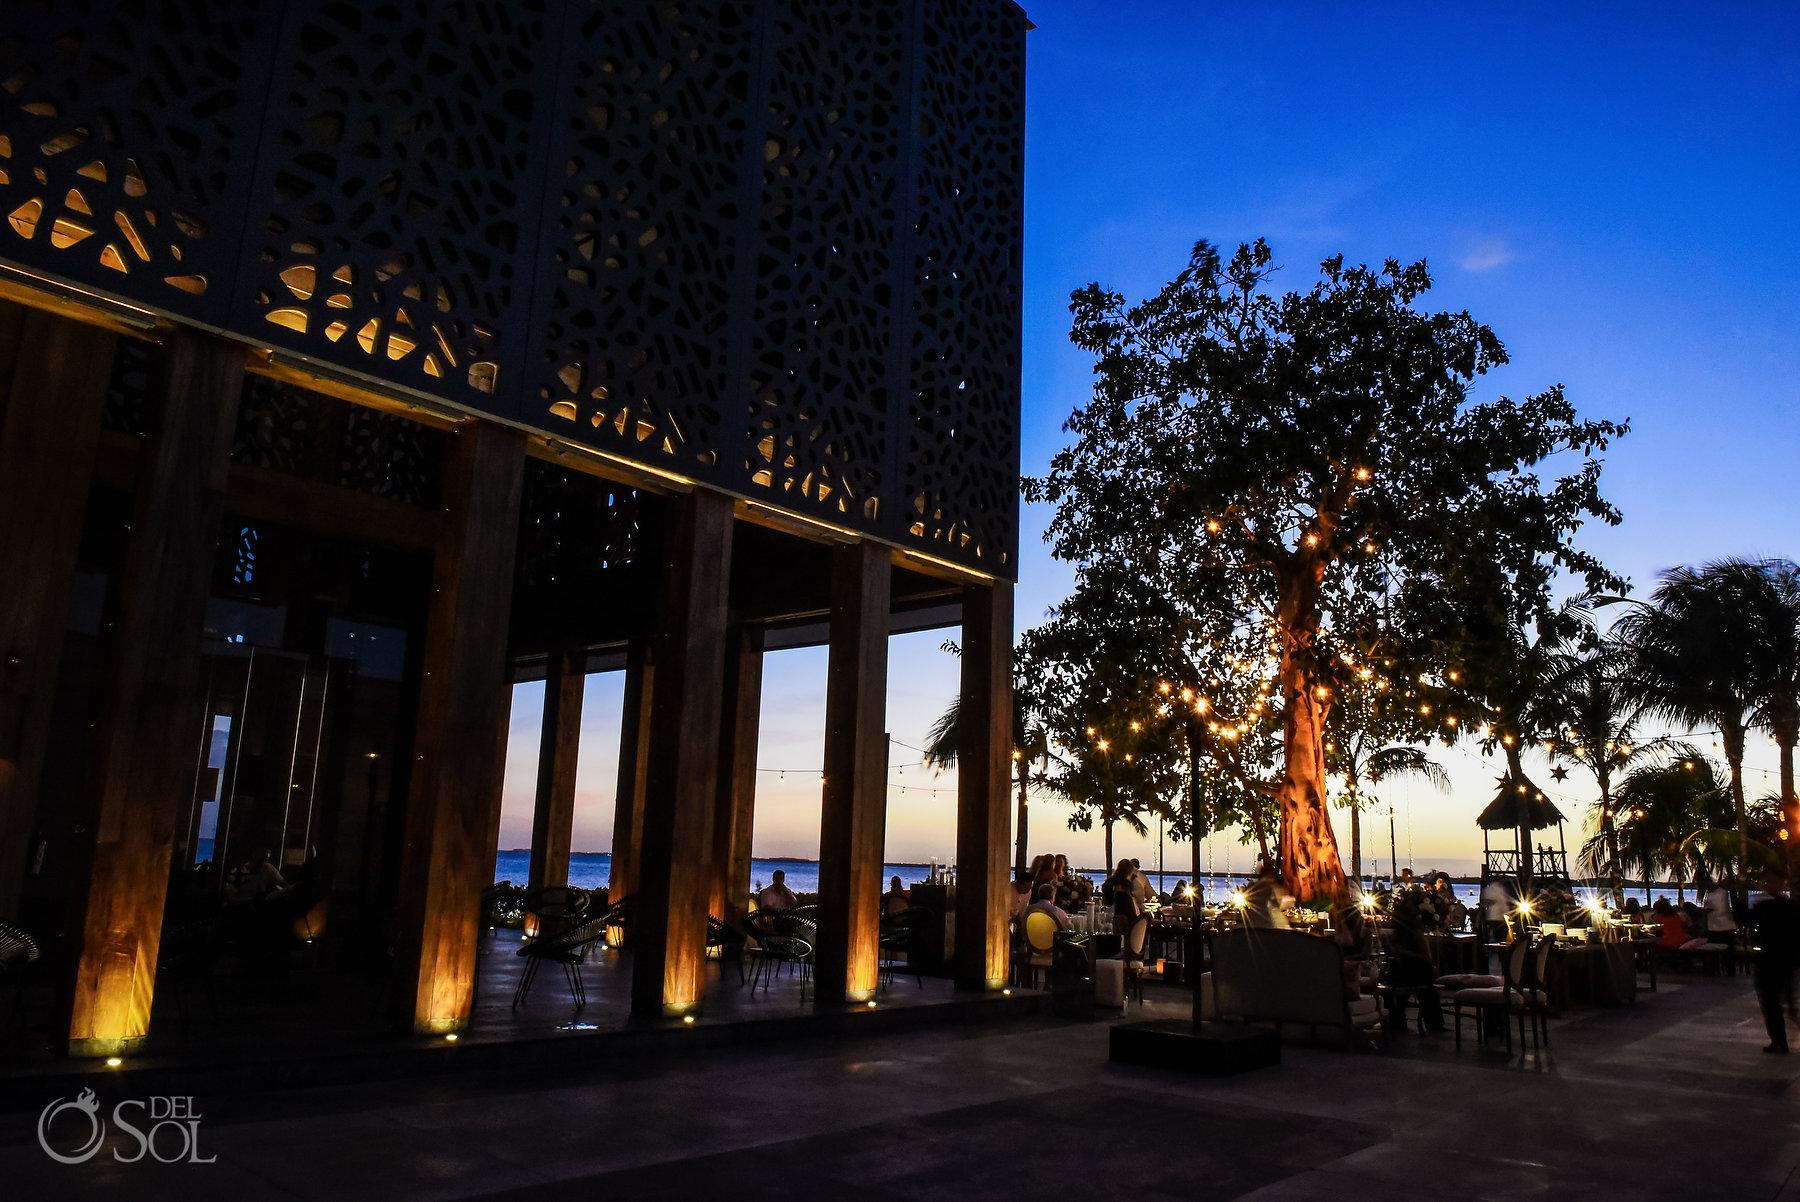 Nizuc same sex wedding reception location Akan terrace twilight scene setter